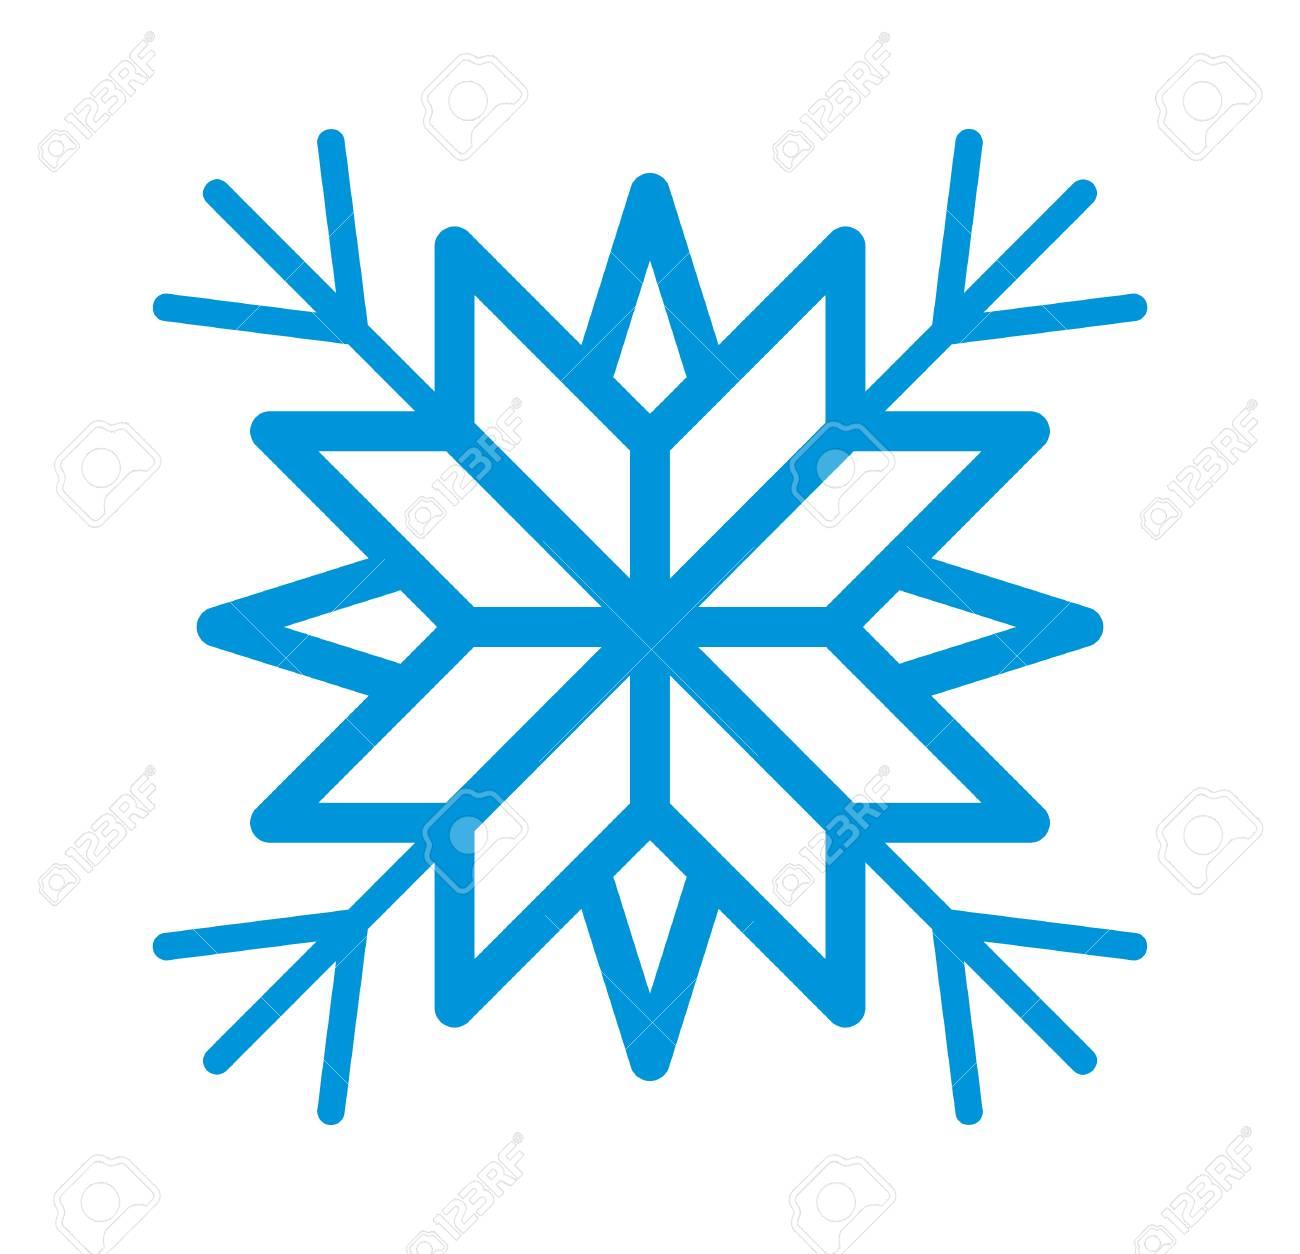 snowflake vector icon royalty free cliparts vectors and stock rh 123rf com snowflake vectors free snowflake vector art